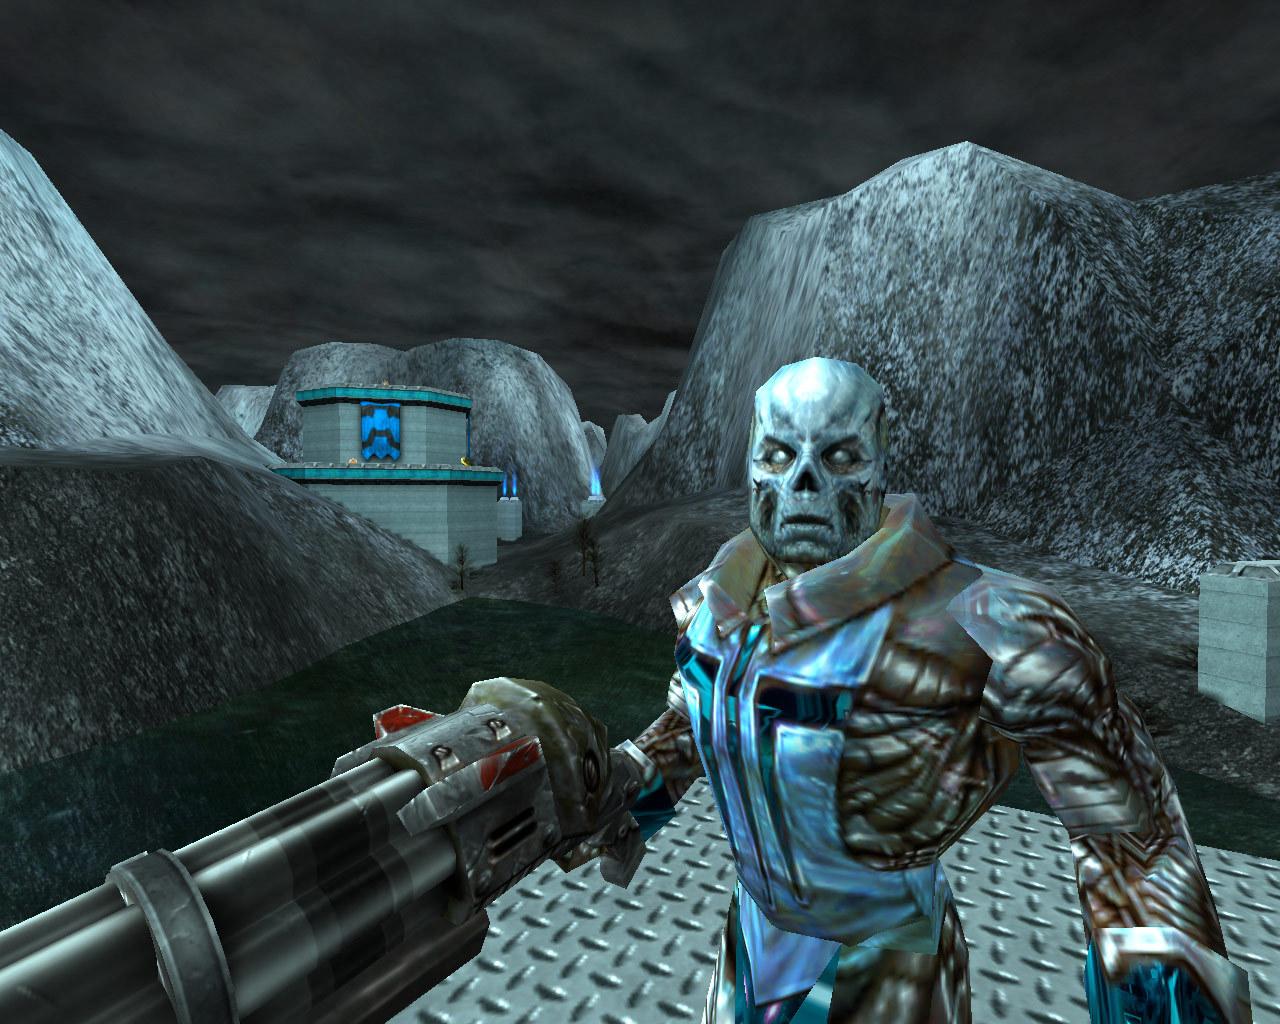 Quake 3 arena download free full game | speed-new.